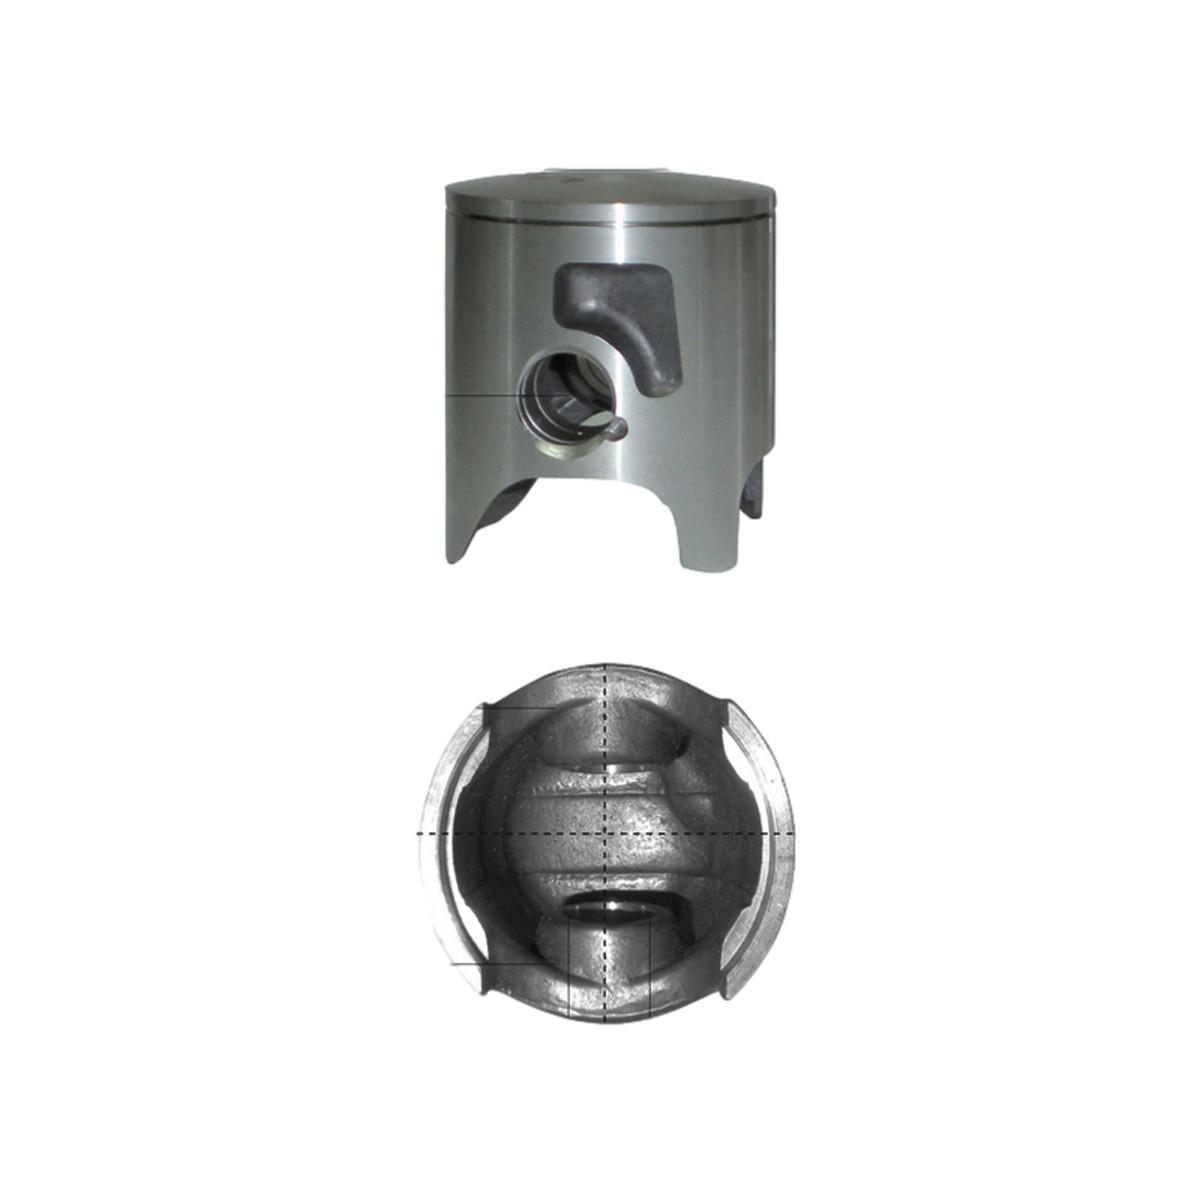 Piston D.40.24mm à 40.28mm Axe D.12mm - BARIKIT Racing Monosegment pour BIDALOT Motor